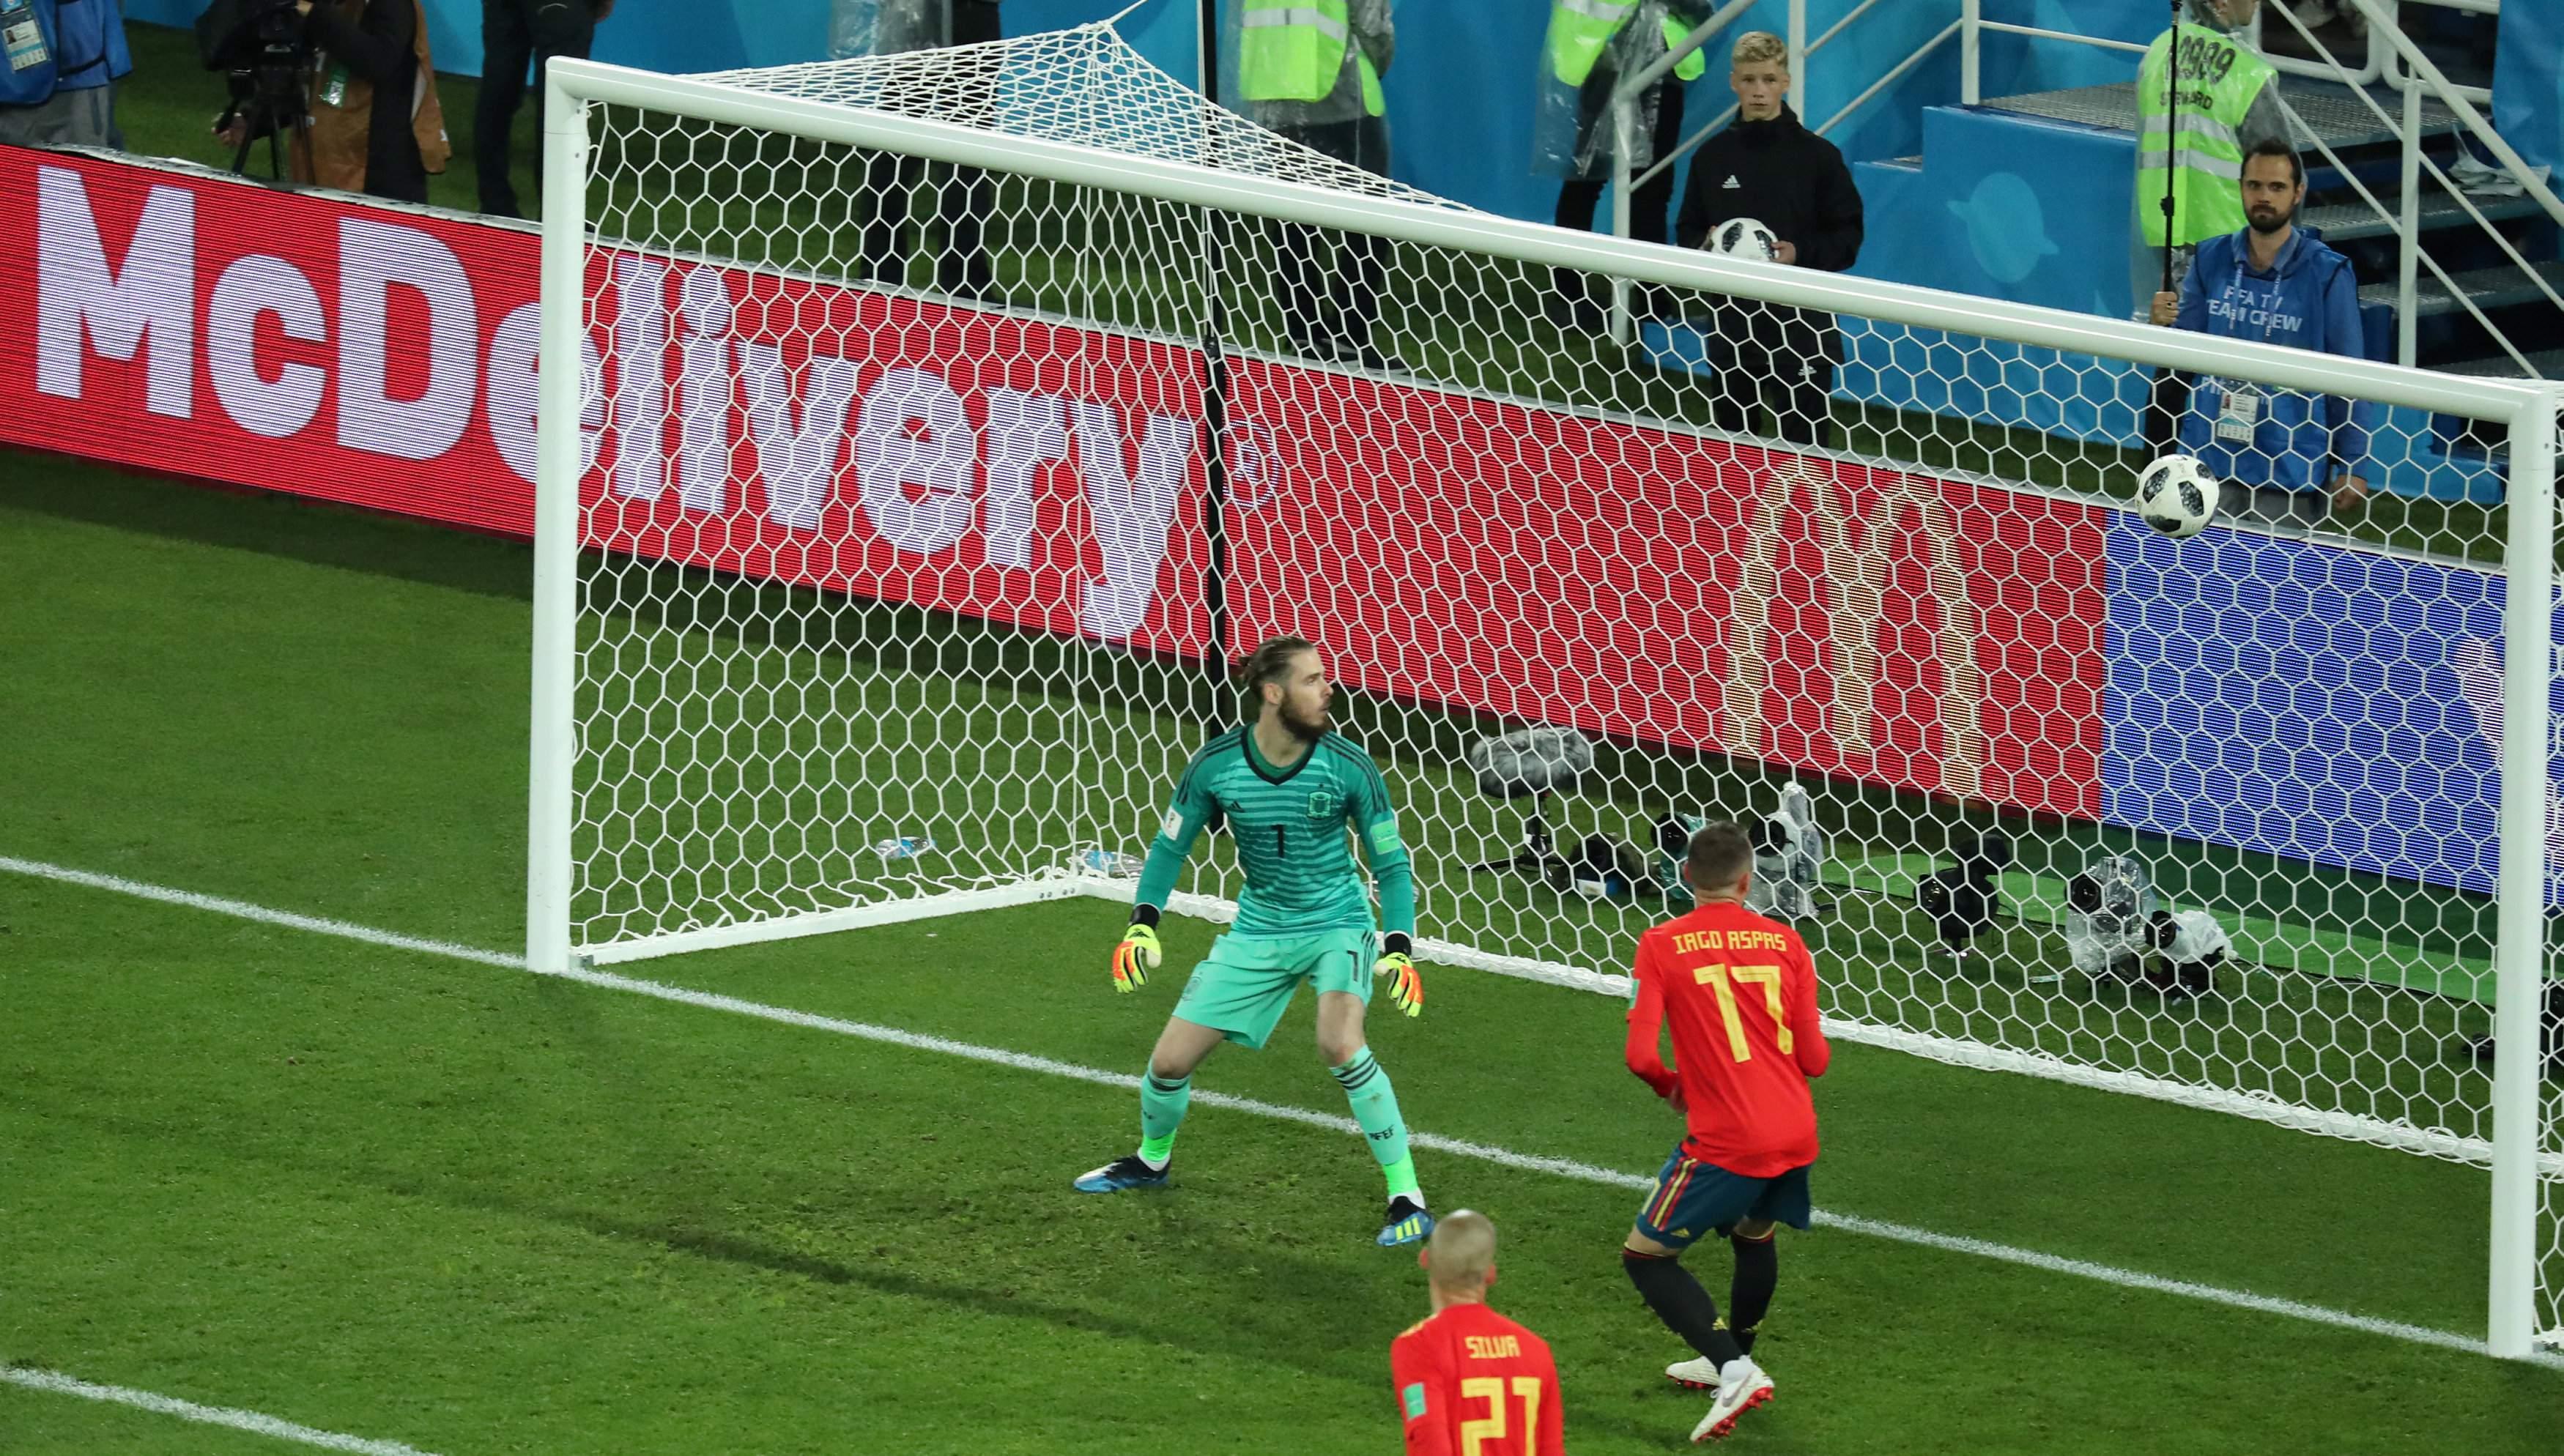 mundial-2018-de-gea-segundo-marruecos-reuters.jpg